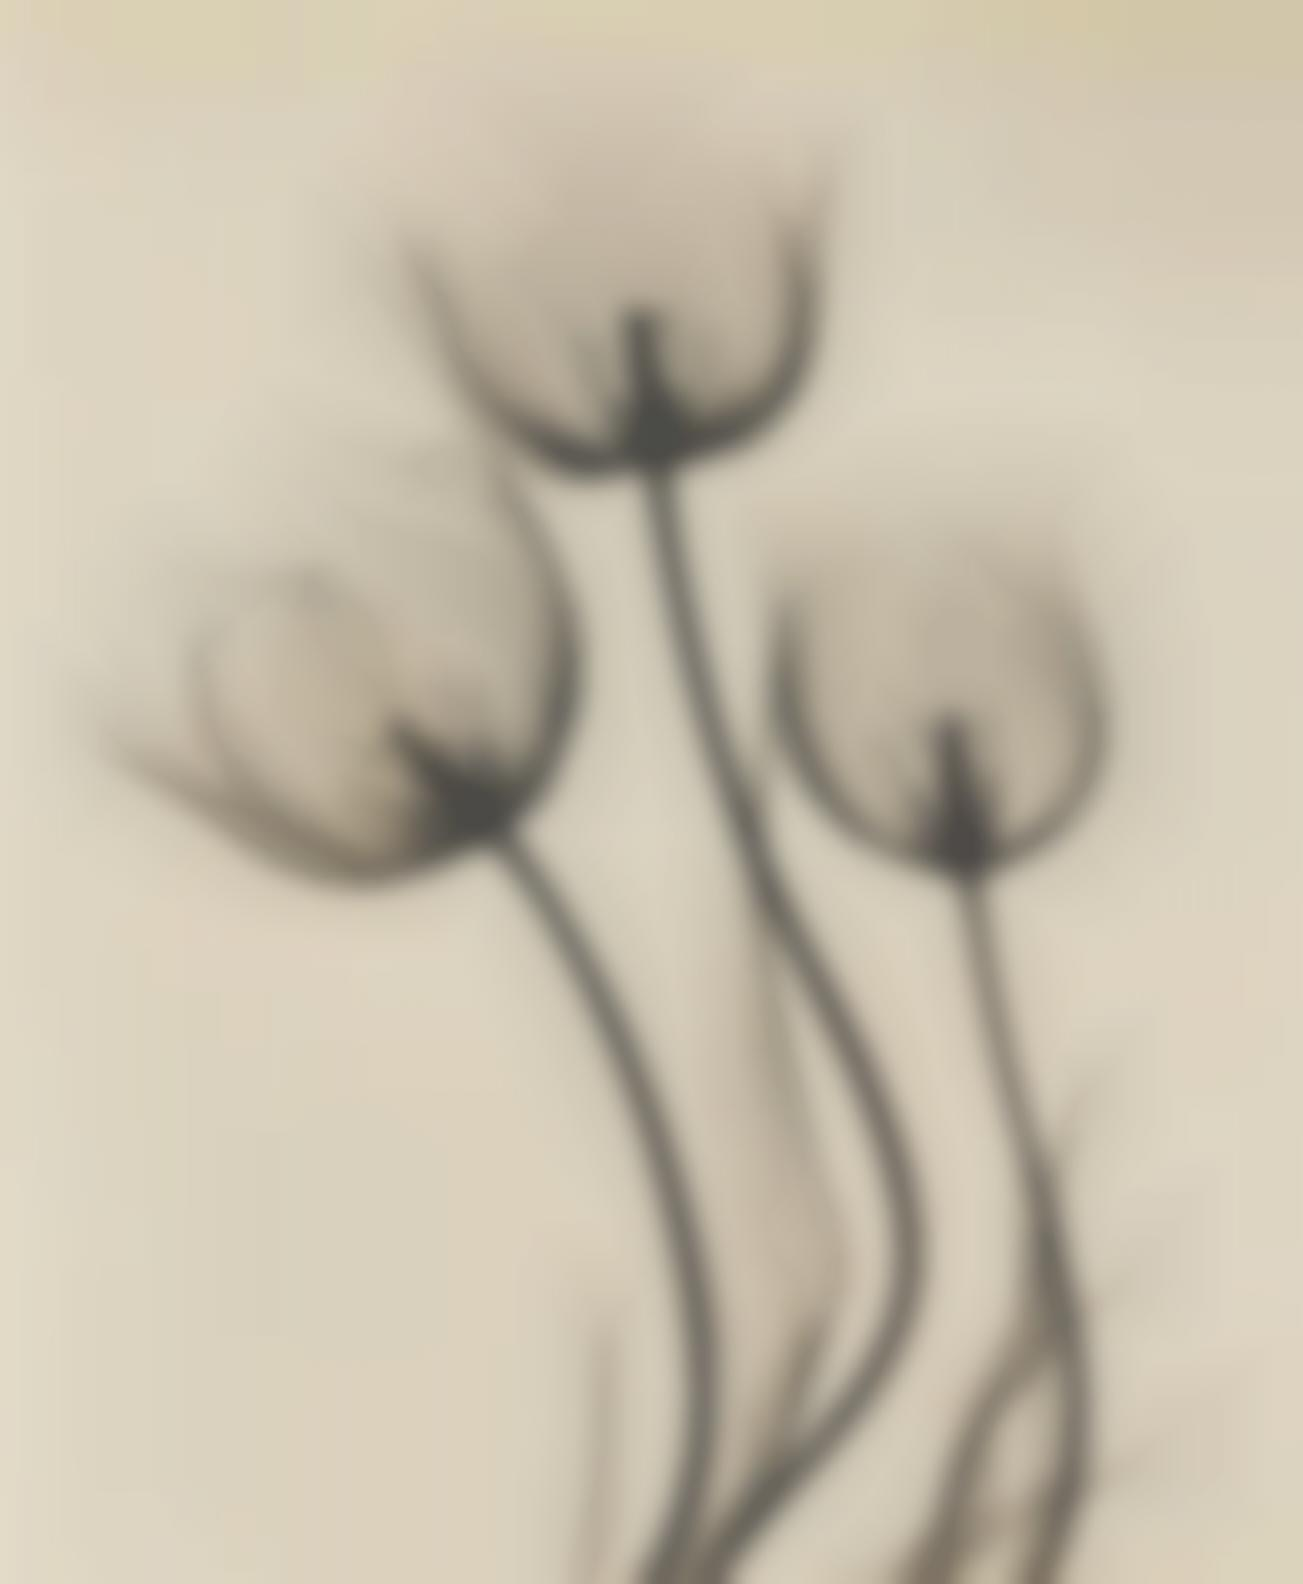 Dr. Dain L. Tasker-Tulips; Lily; And Strelitzia (Bird Of Pardise), c. 1930-